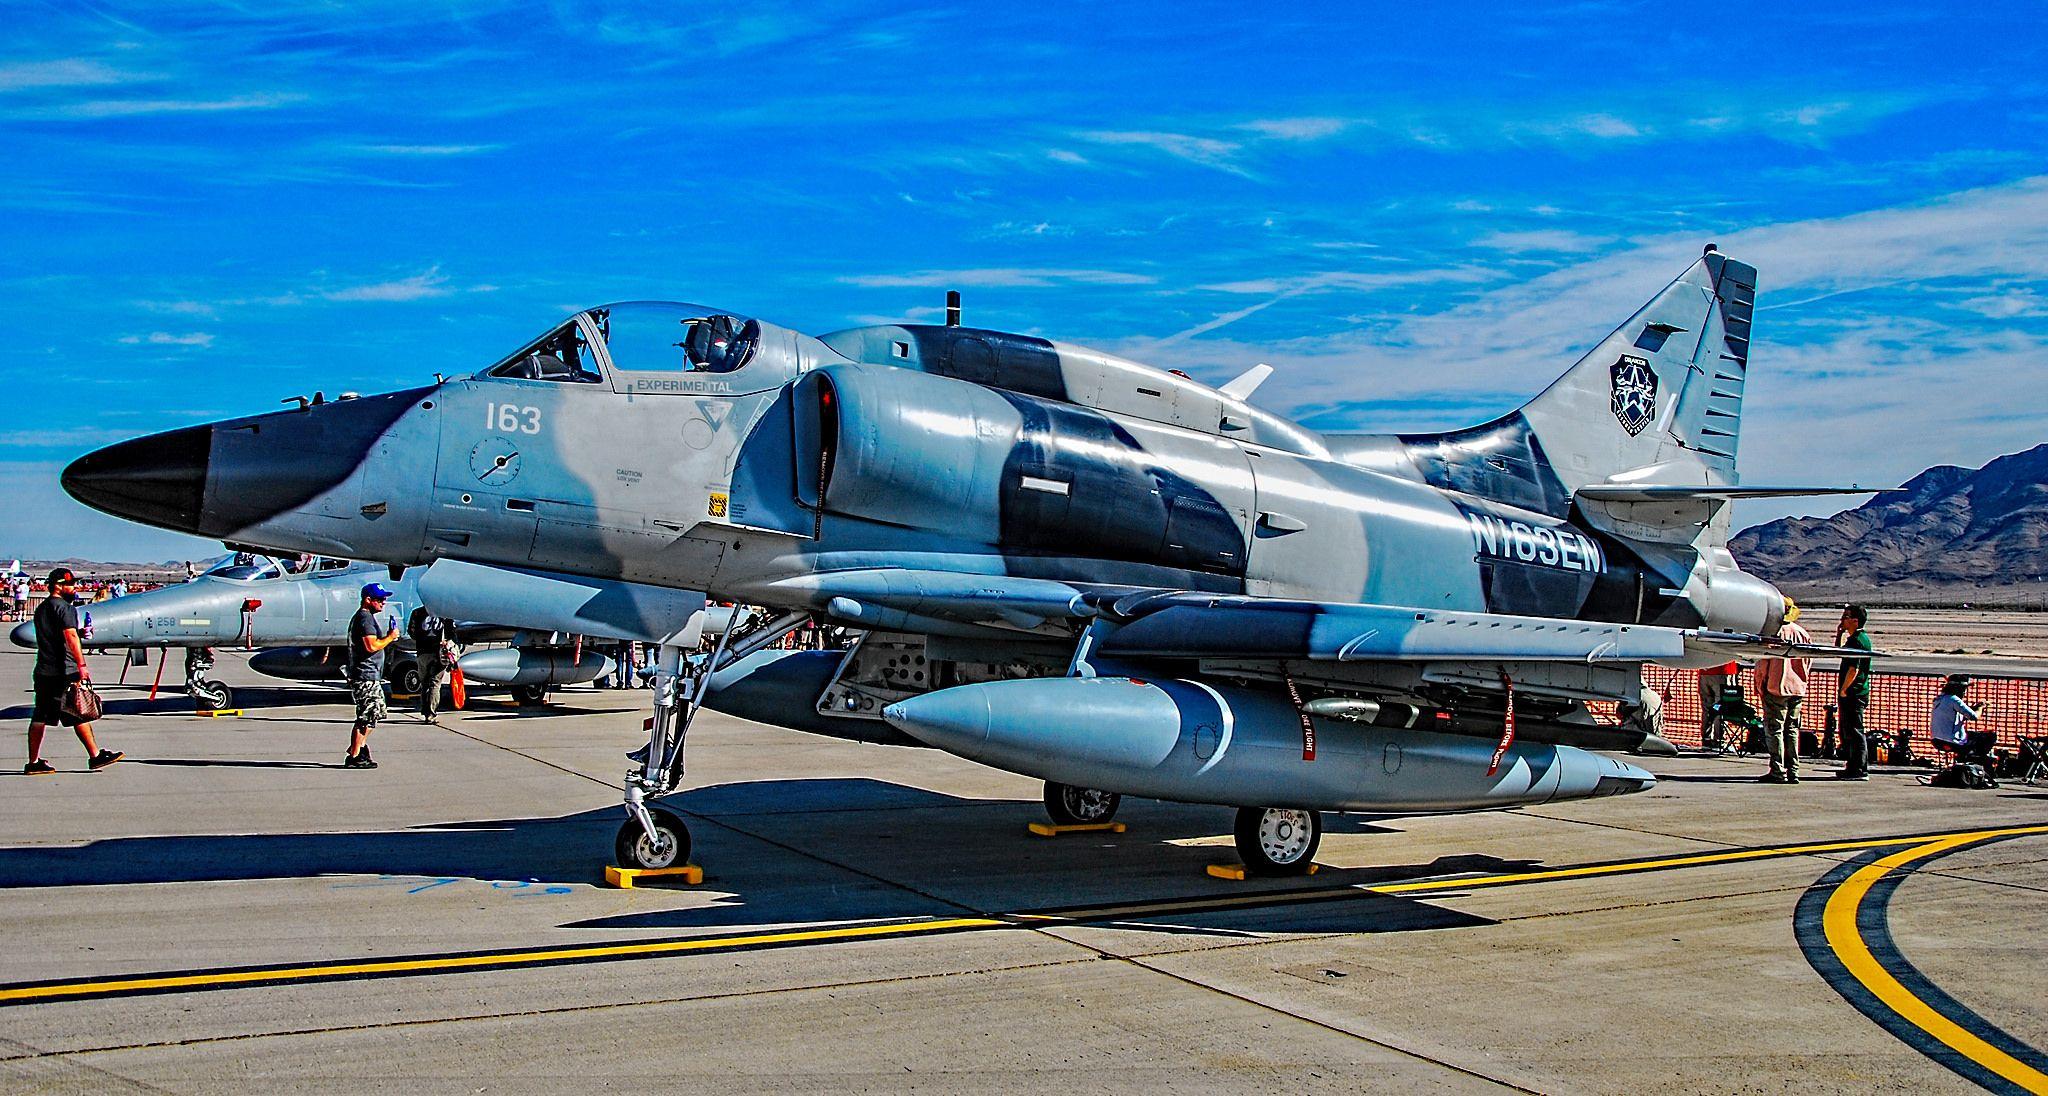 N163EM Draken 1972 McDonnell Douglas A4N Skyhawk C/N